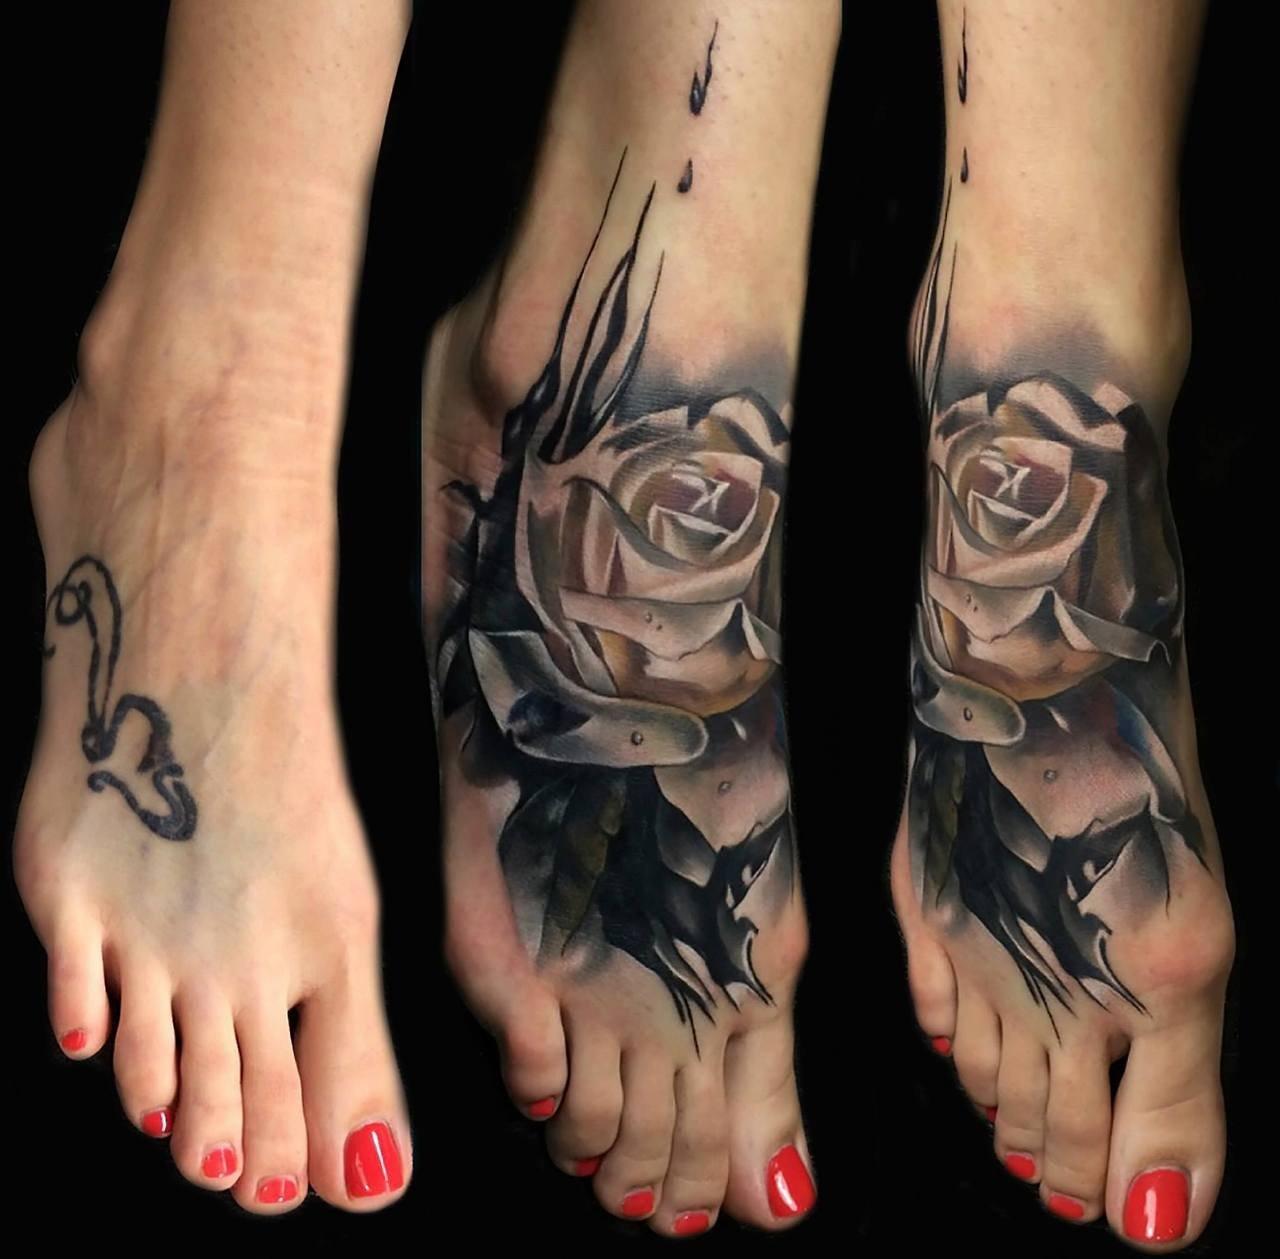 10 Cute Foot Tattoo Cover Up Ideas rose tattoo designs for foot foot rose cover up tattoo design best 2021